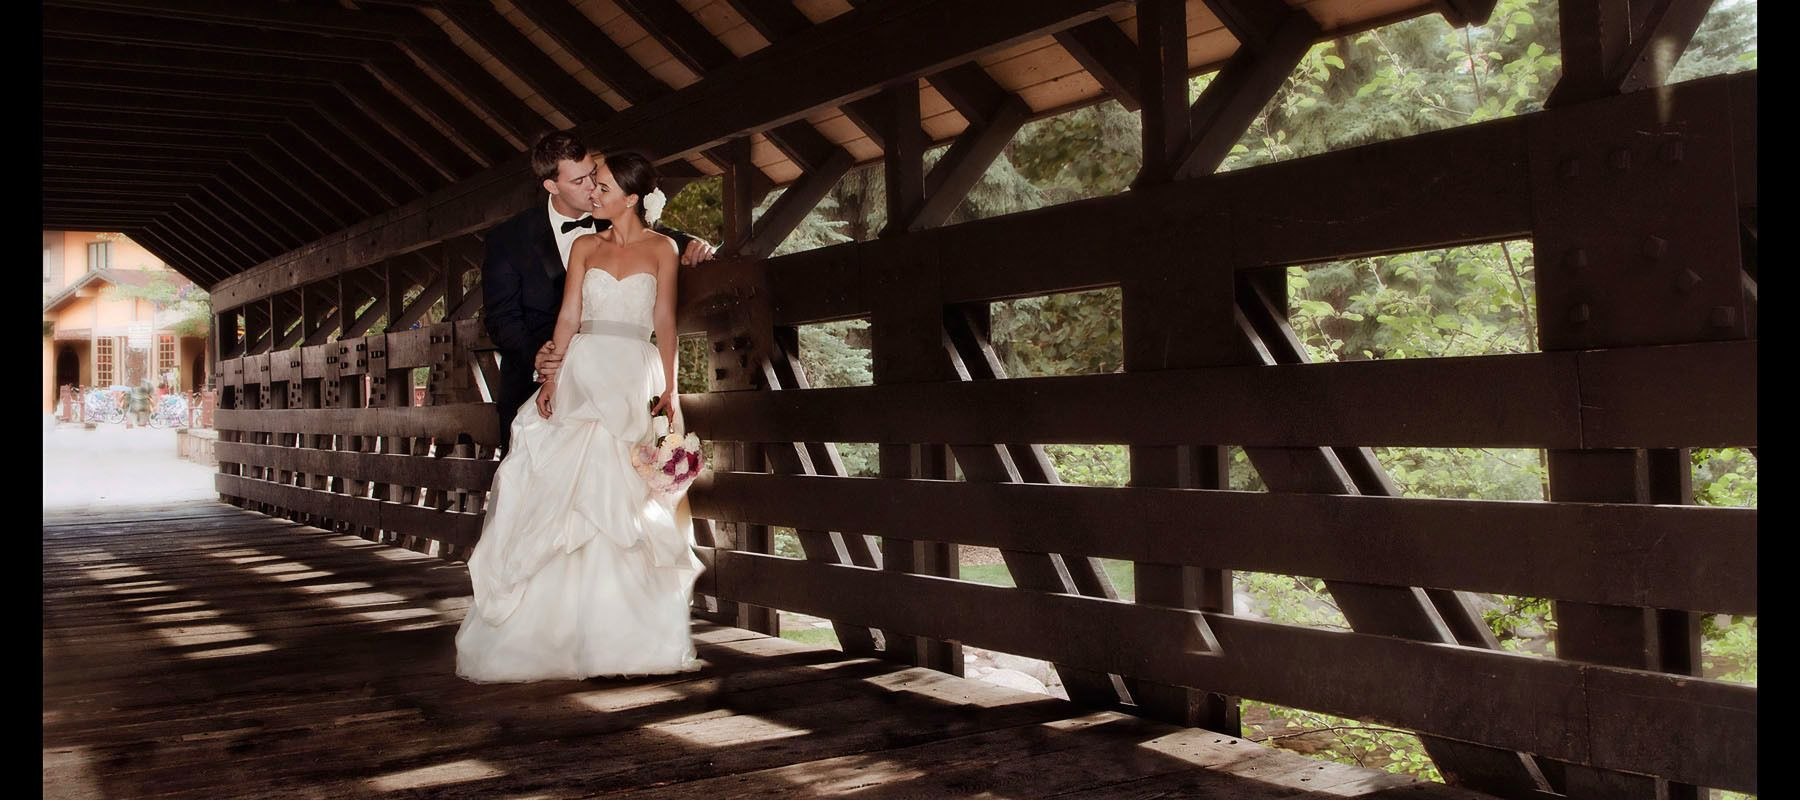 1kiss_the_bride_on_vail_bridge